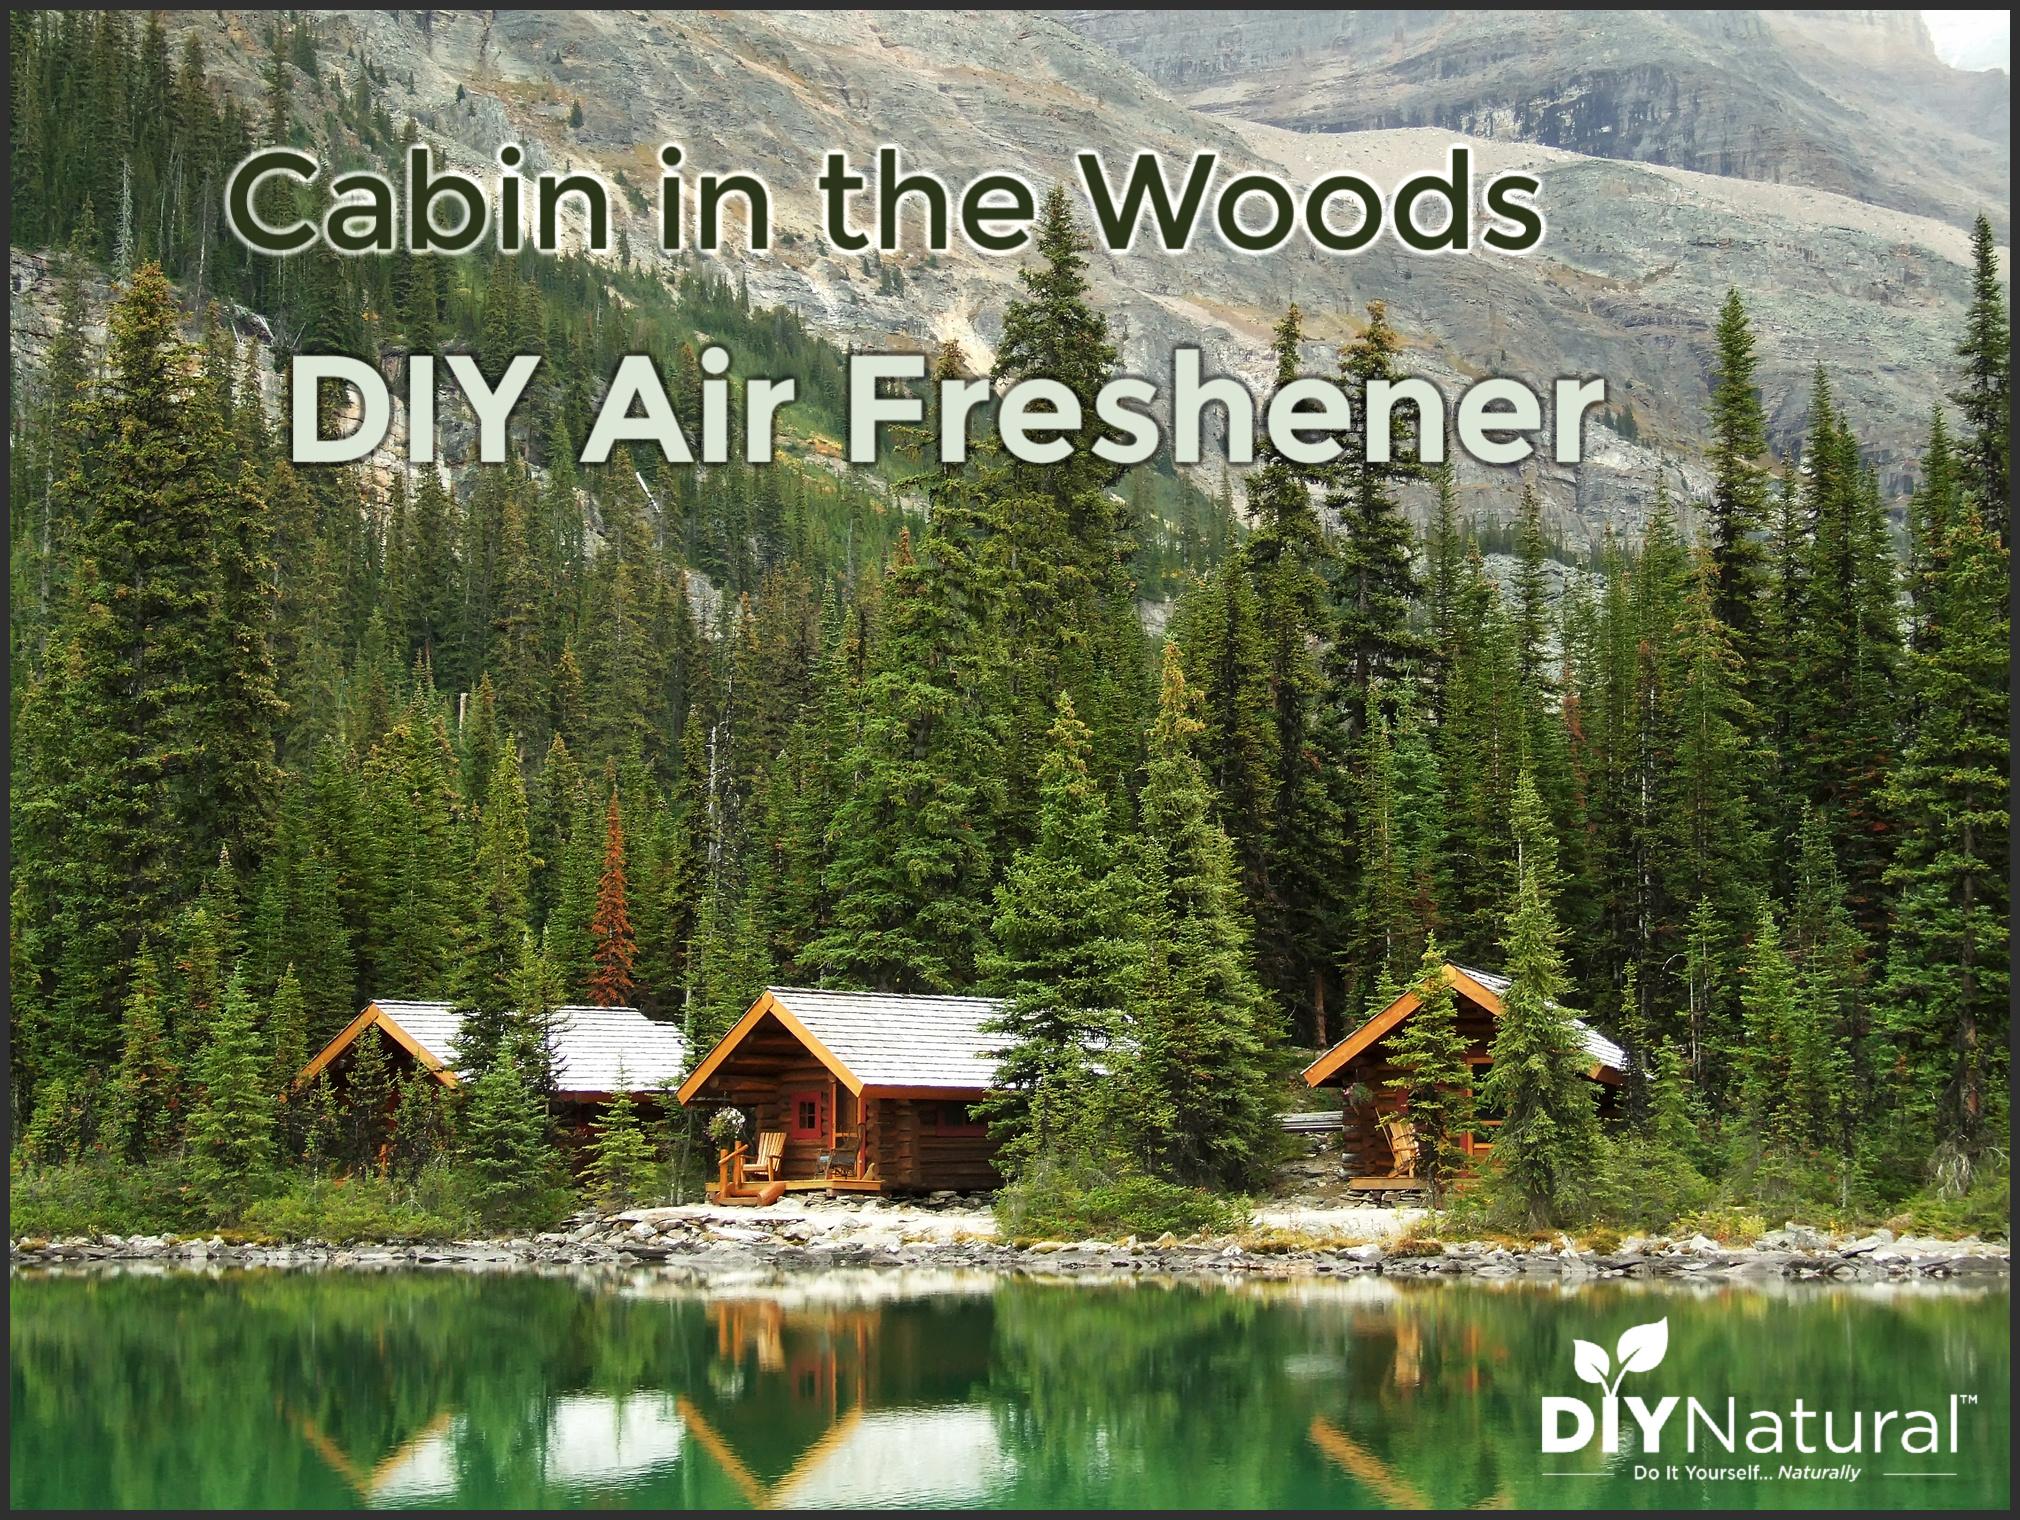 Diy Air Freshener A Pine Scented Essential Oil Air Freshener Recipe